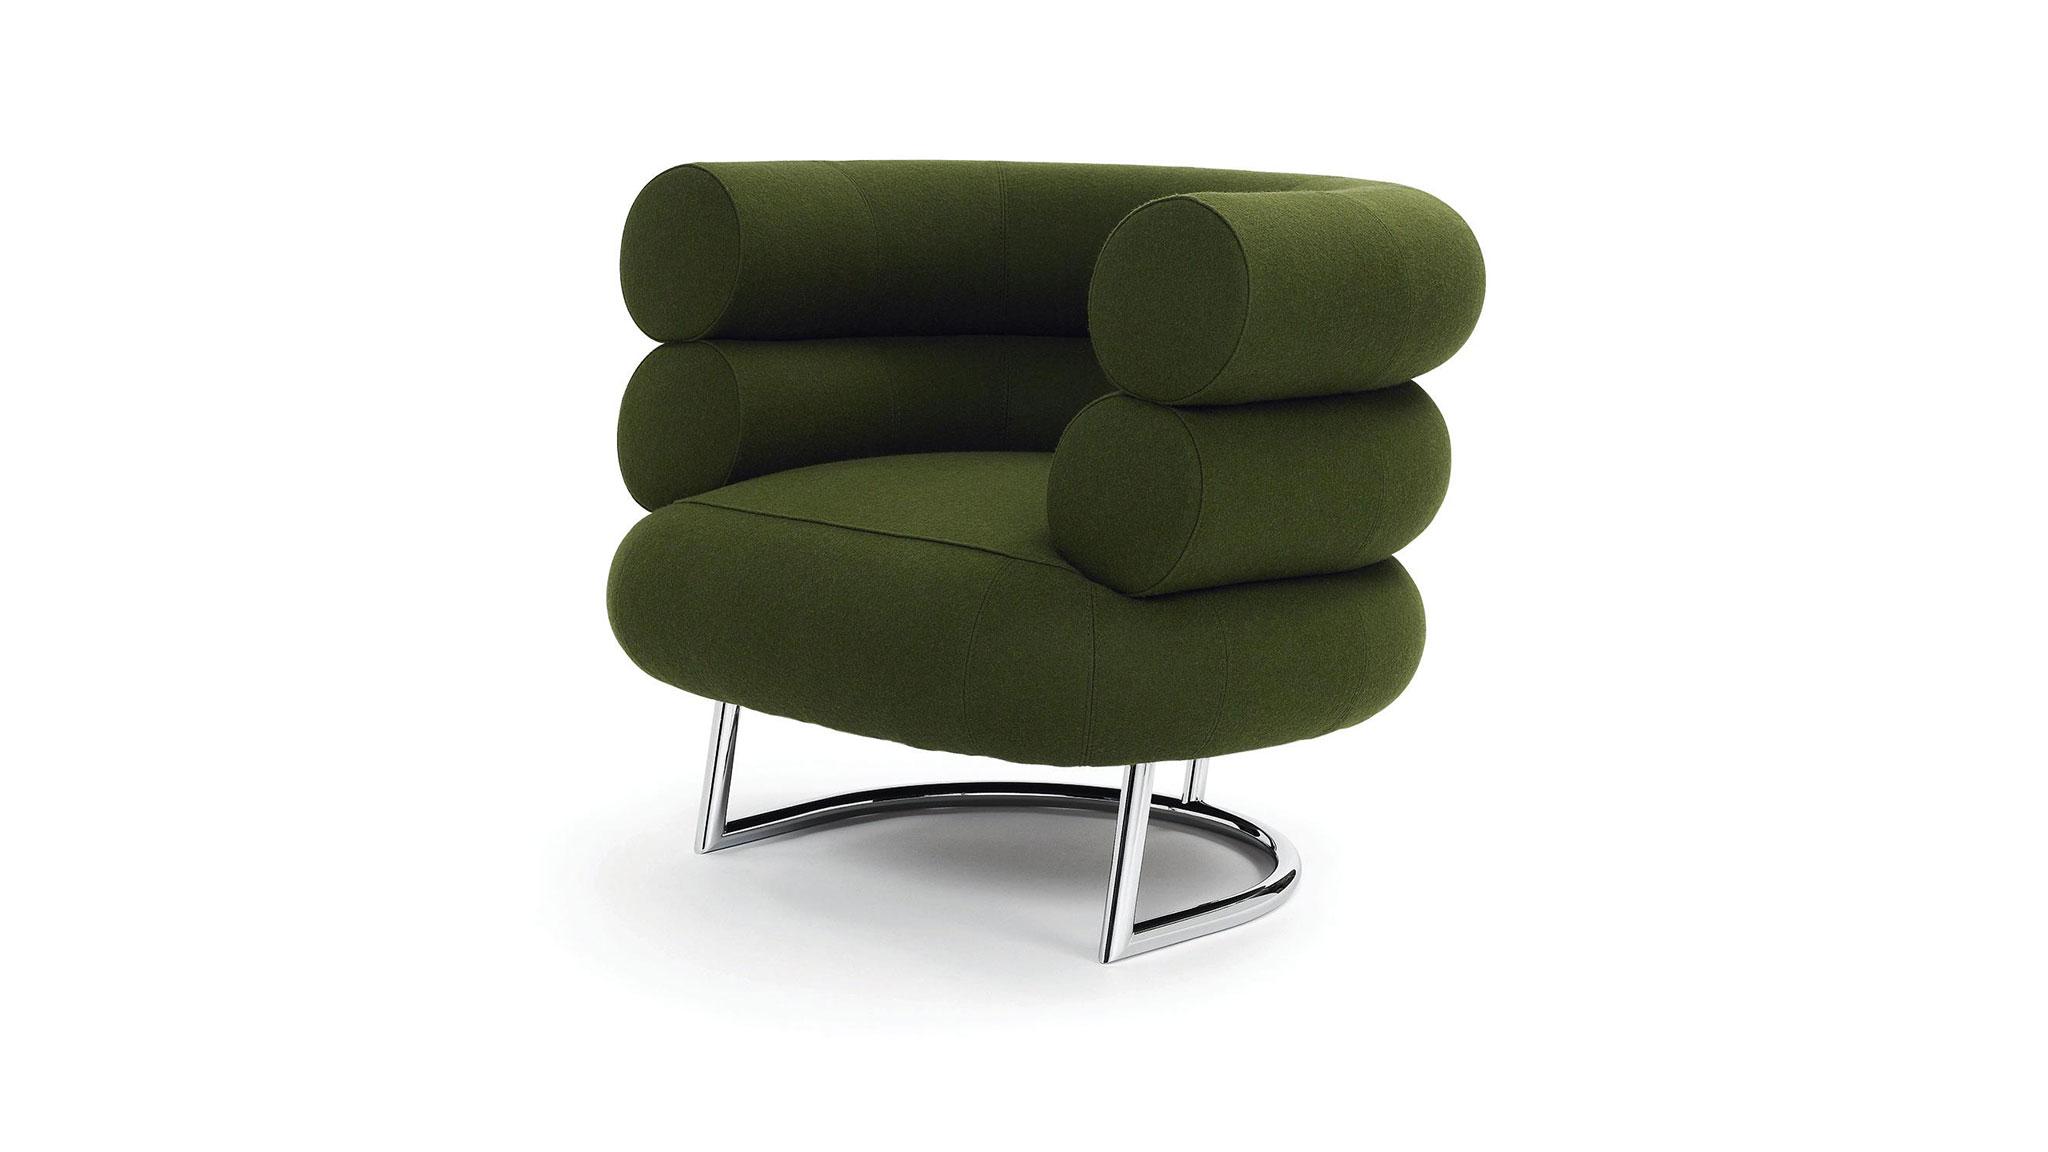 design classic the bibendum chair by eileen gray financial times